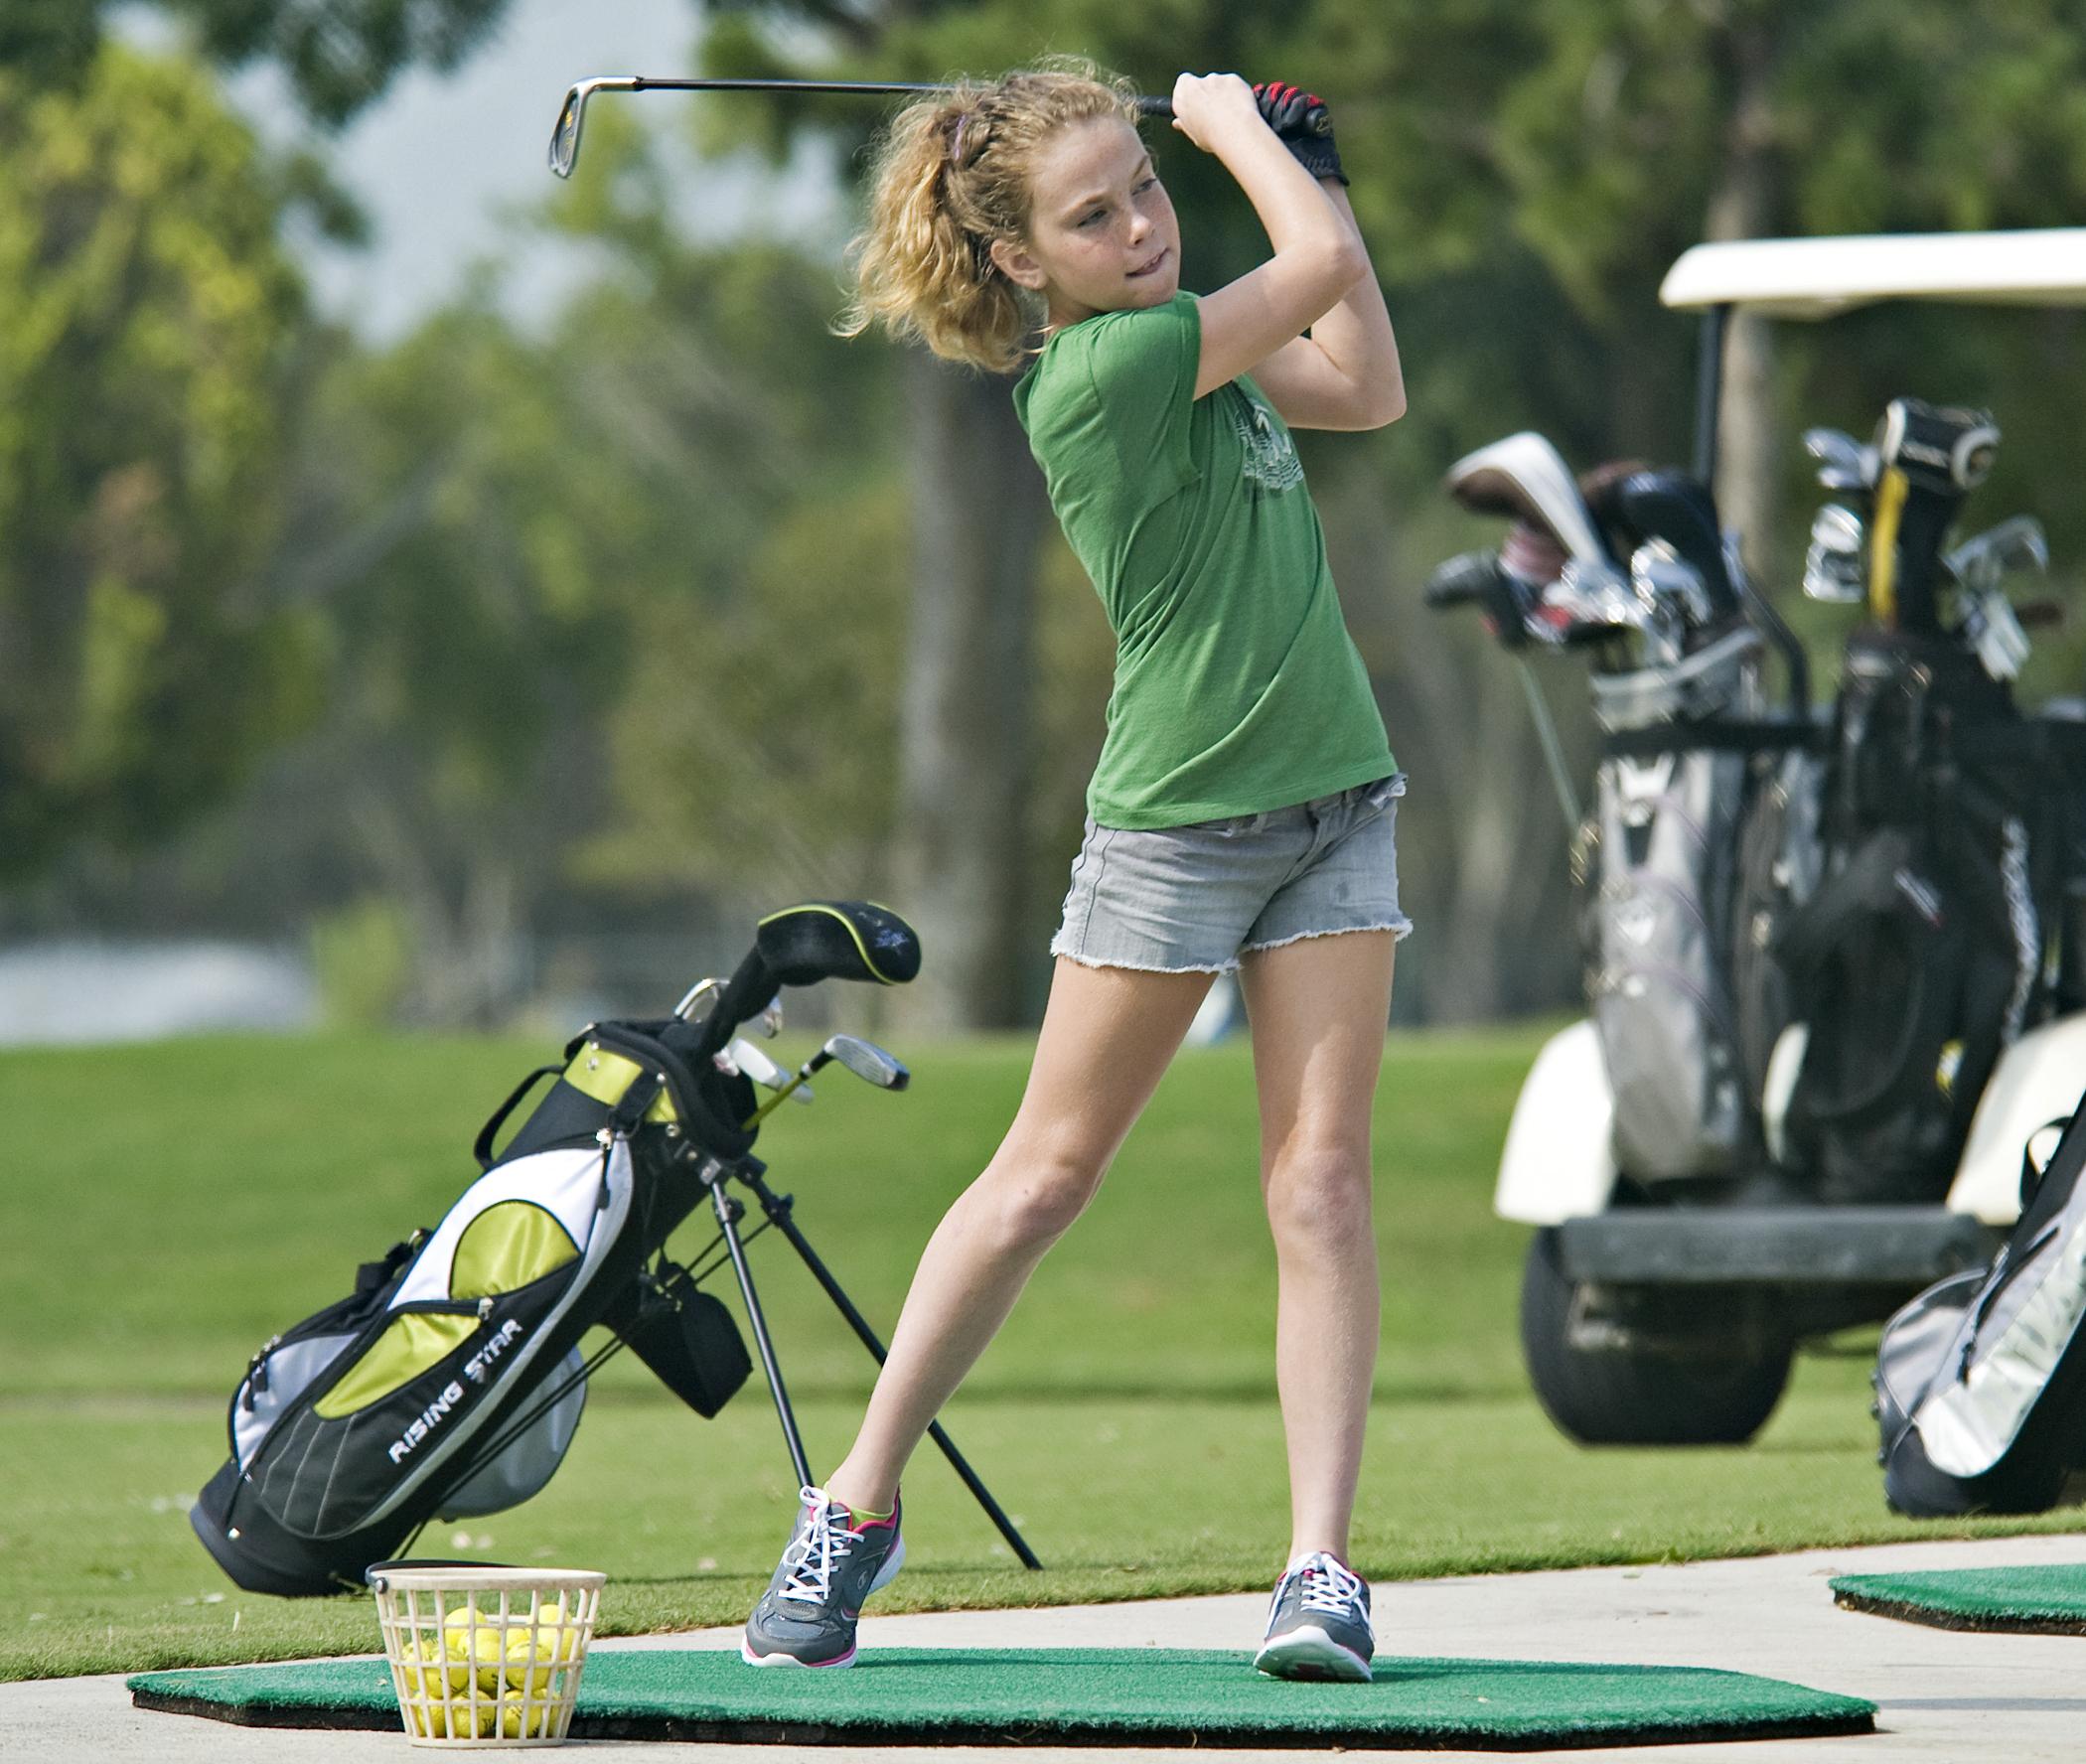 https://upload.wikimedia.org/wikipedia/commons/b/bc/Annual_Junior_Golf_Clinic_120613-F-ST721-276.jpg